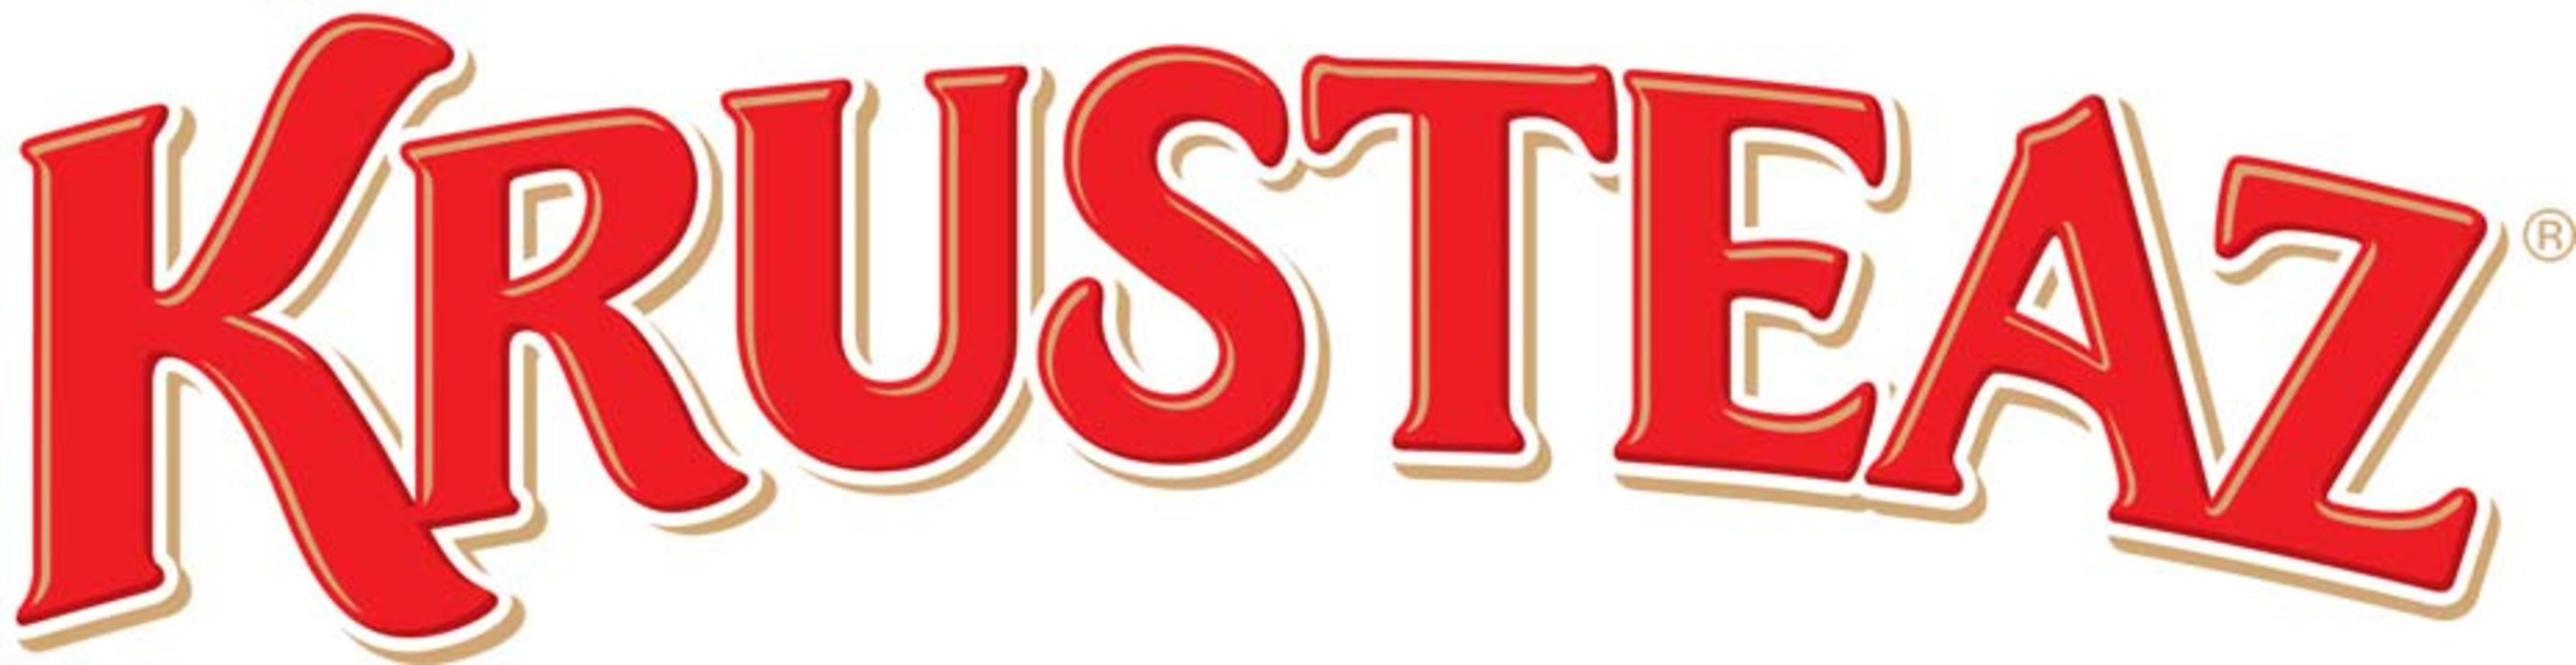 Krusteaz logo